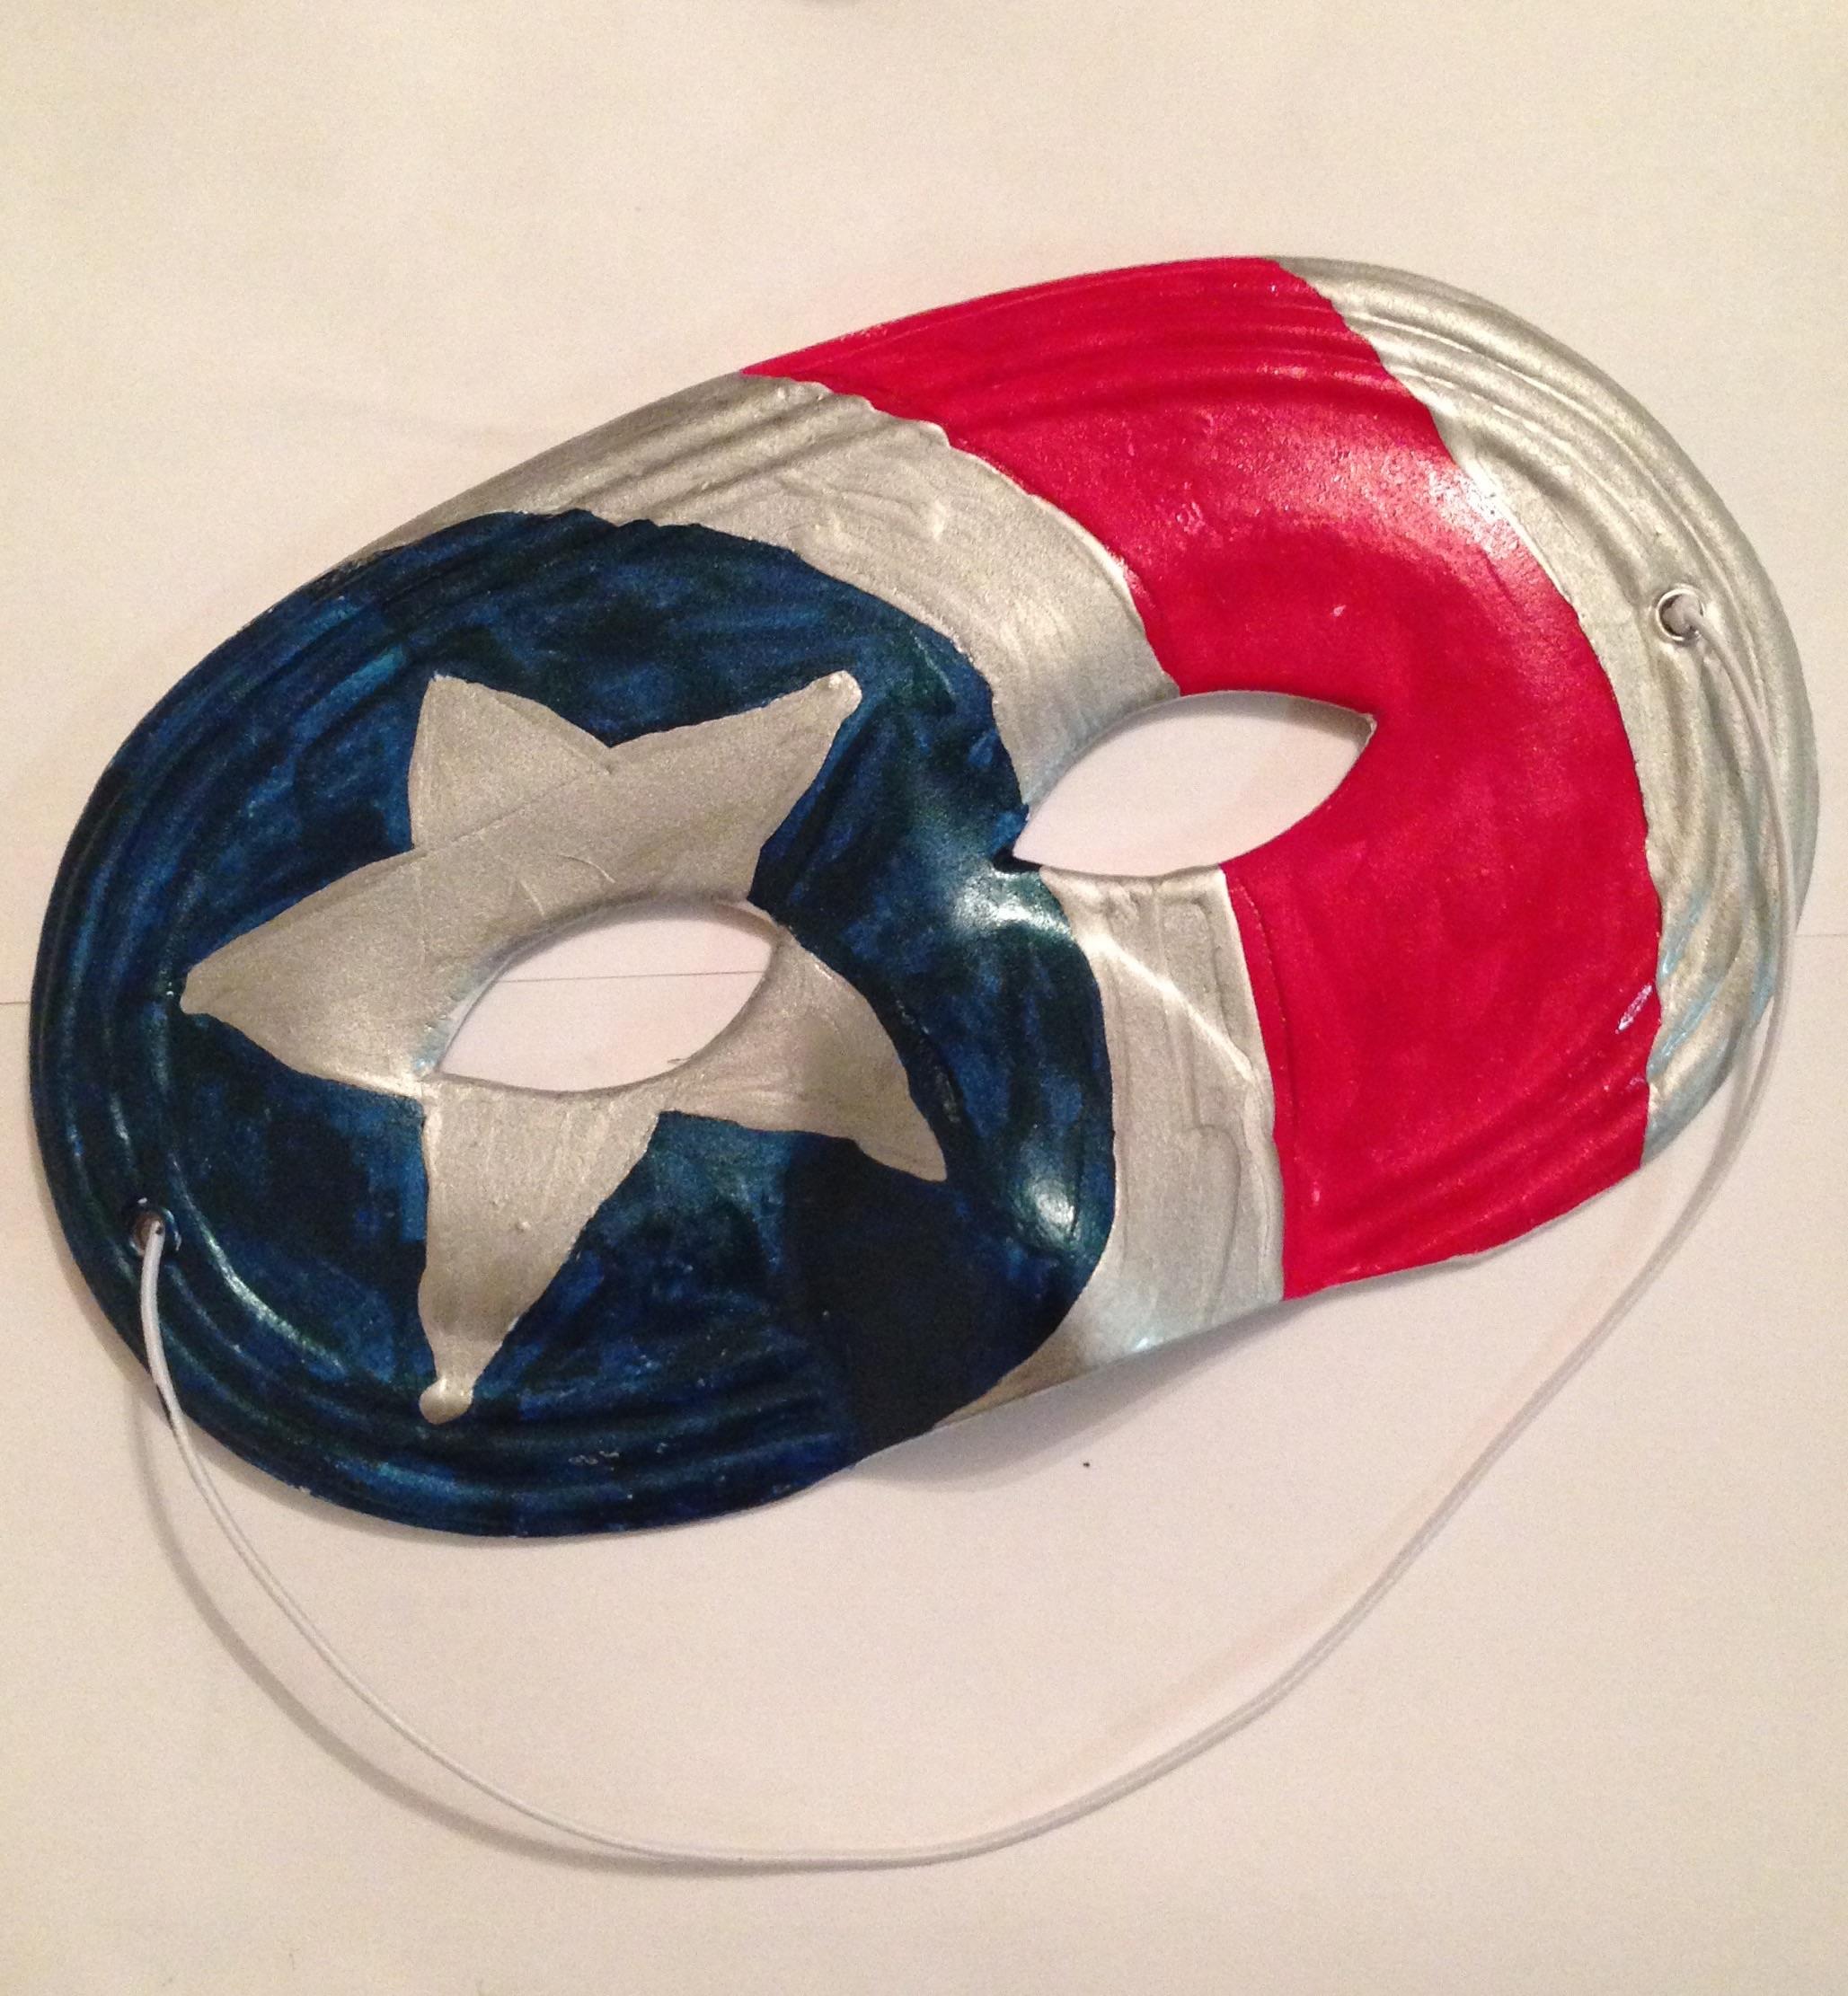 Diy Superhero Mask The Chirpy Hen